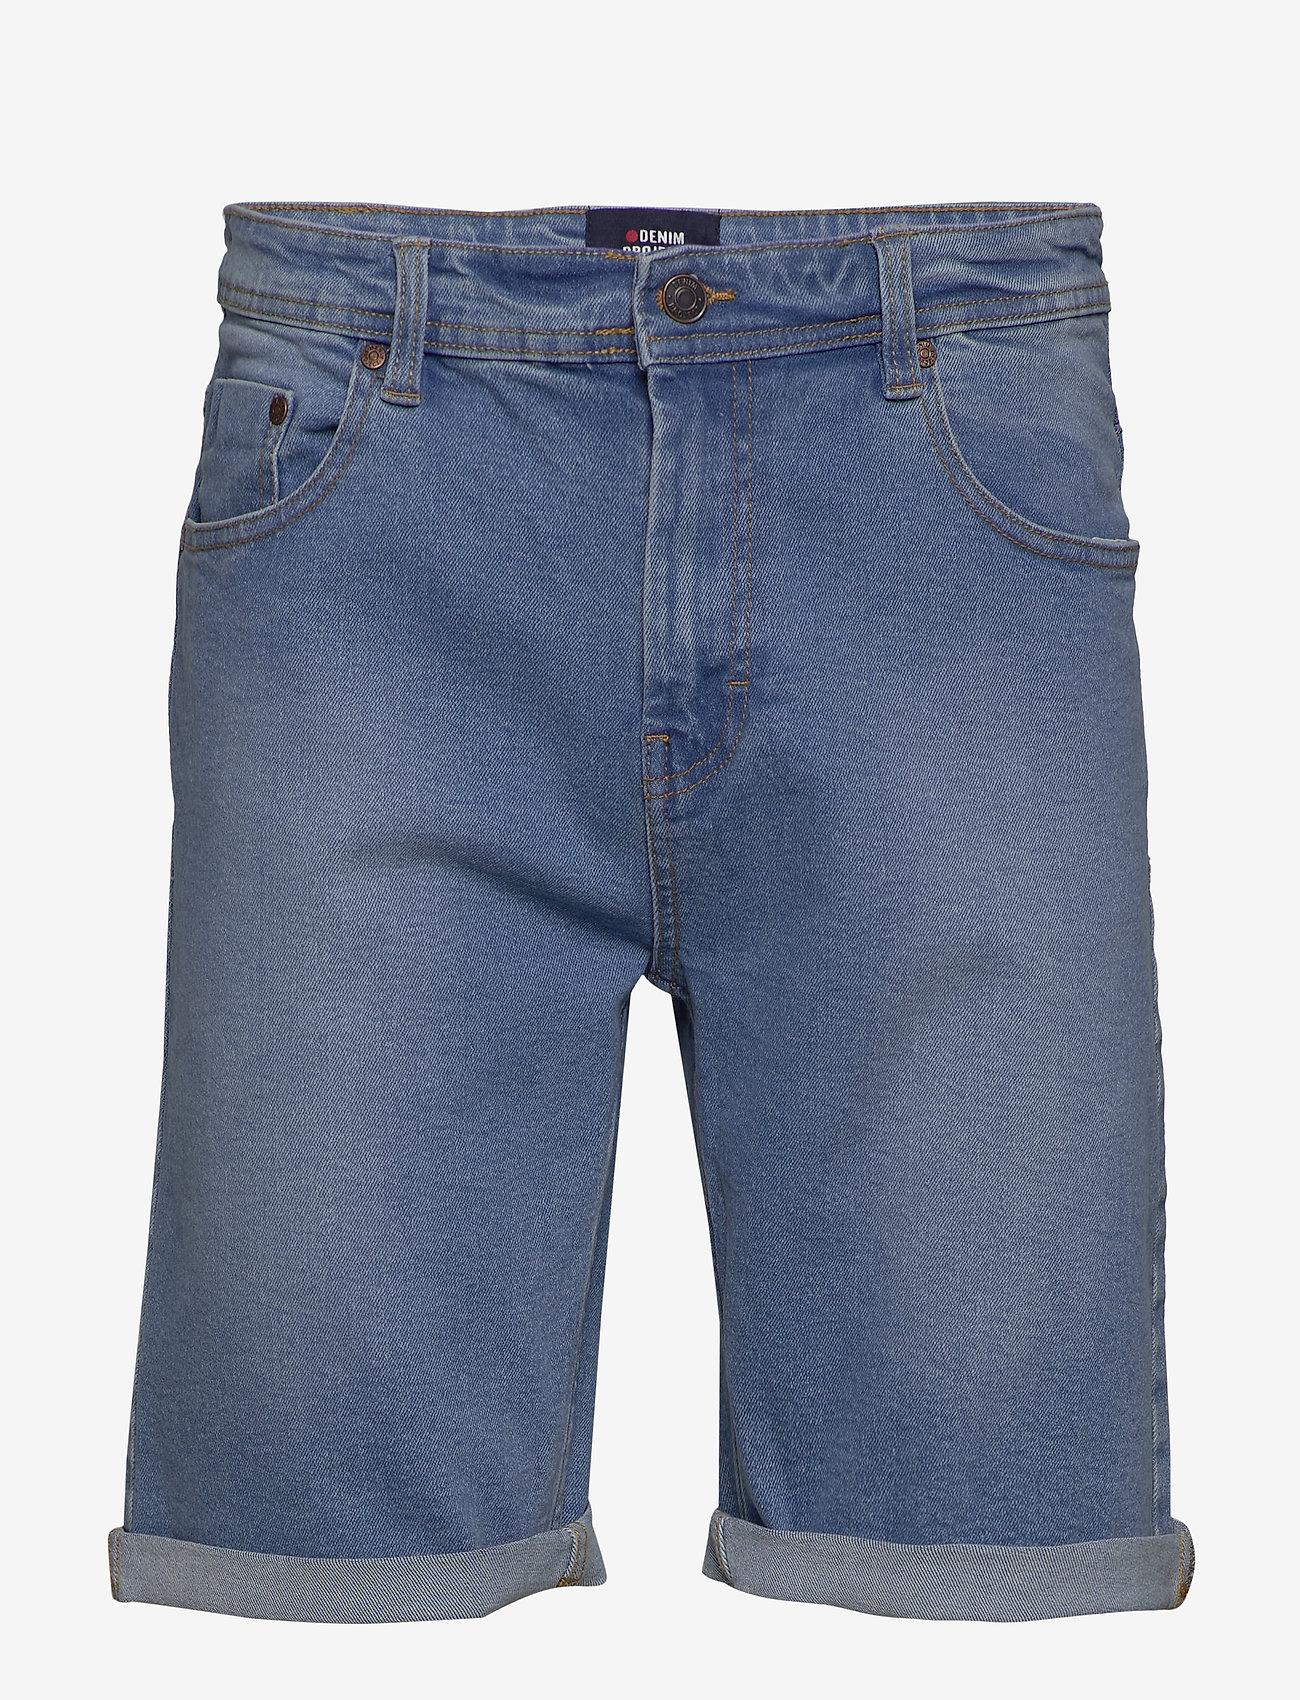 Denim project - Mr. Orange - denim shorts - light blue - 0